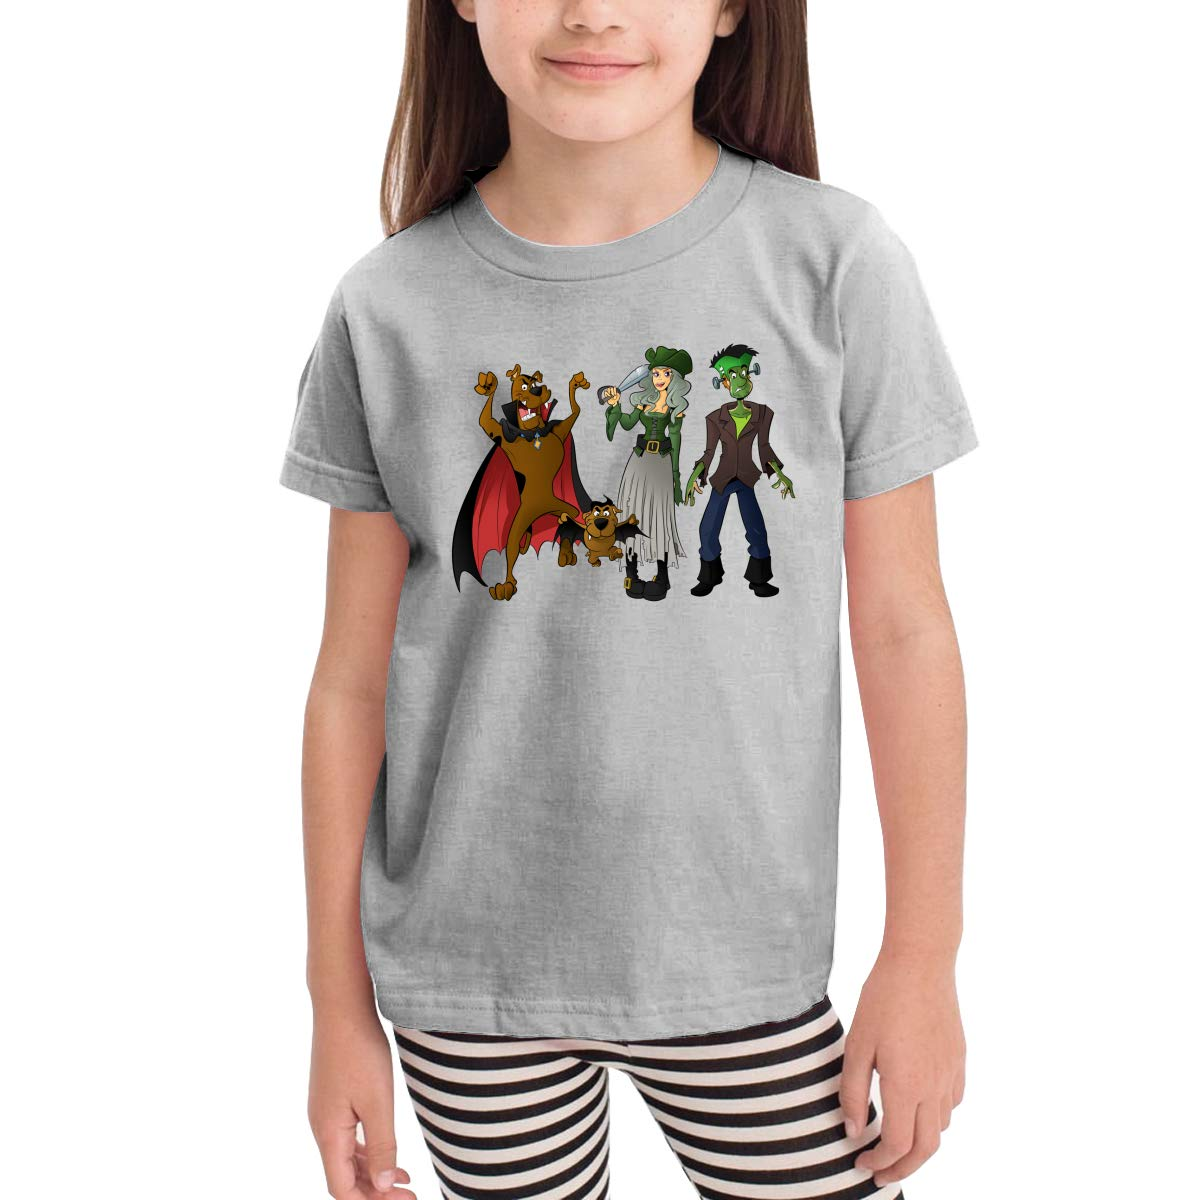 Halloween Scooby-doo Kids Crew Neck 100/% Soft Cotton Short Shirts Tees T-Shirts